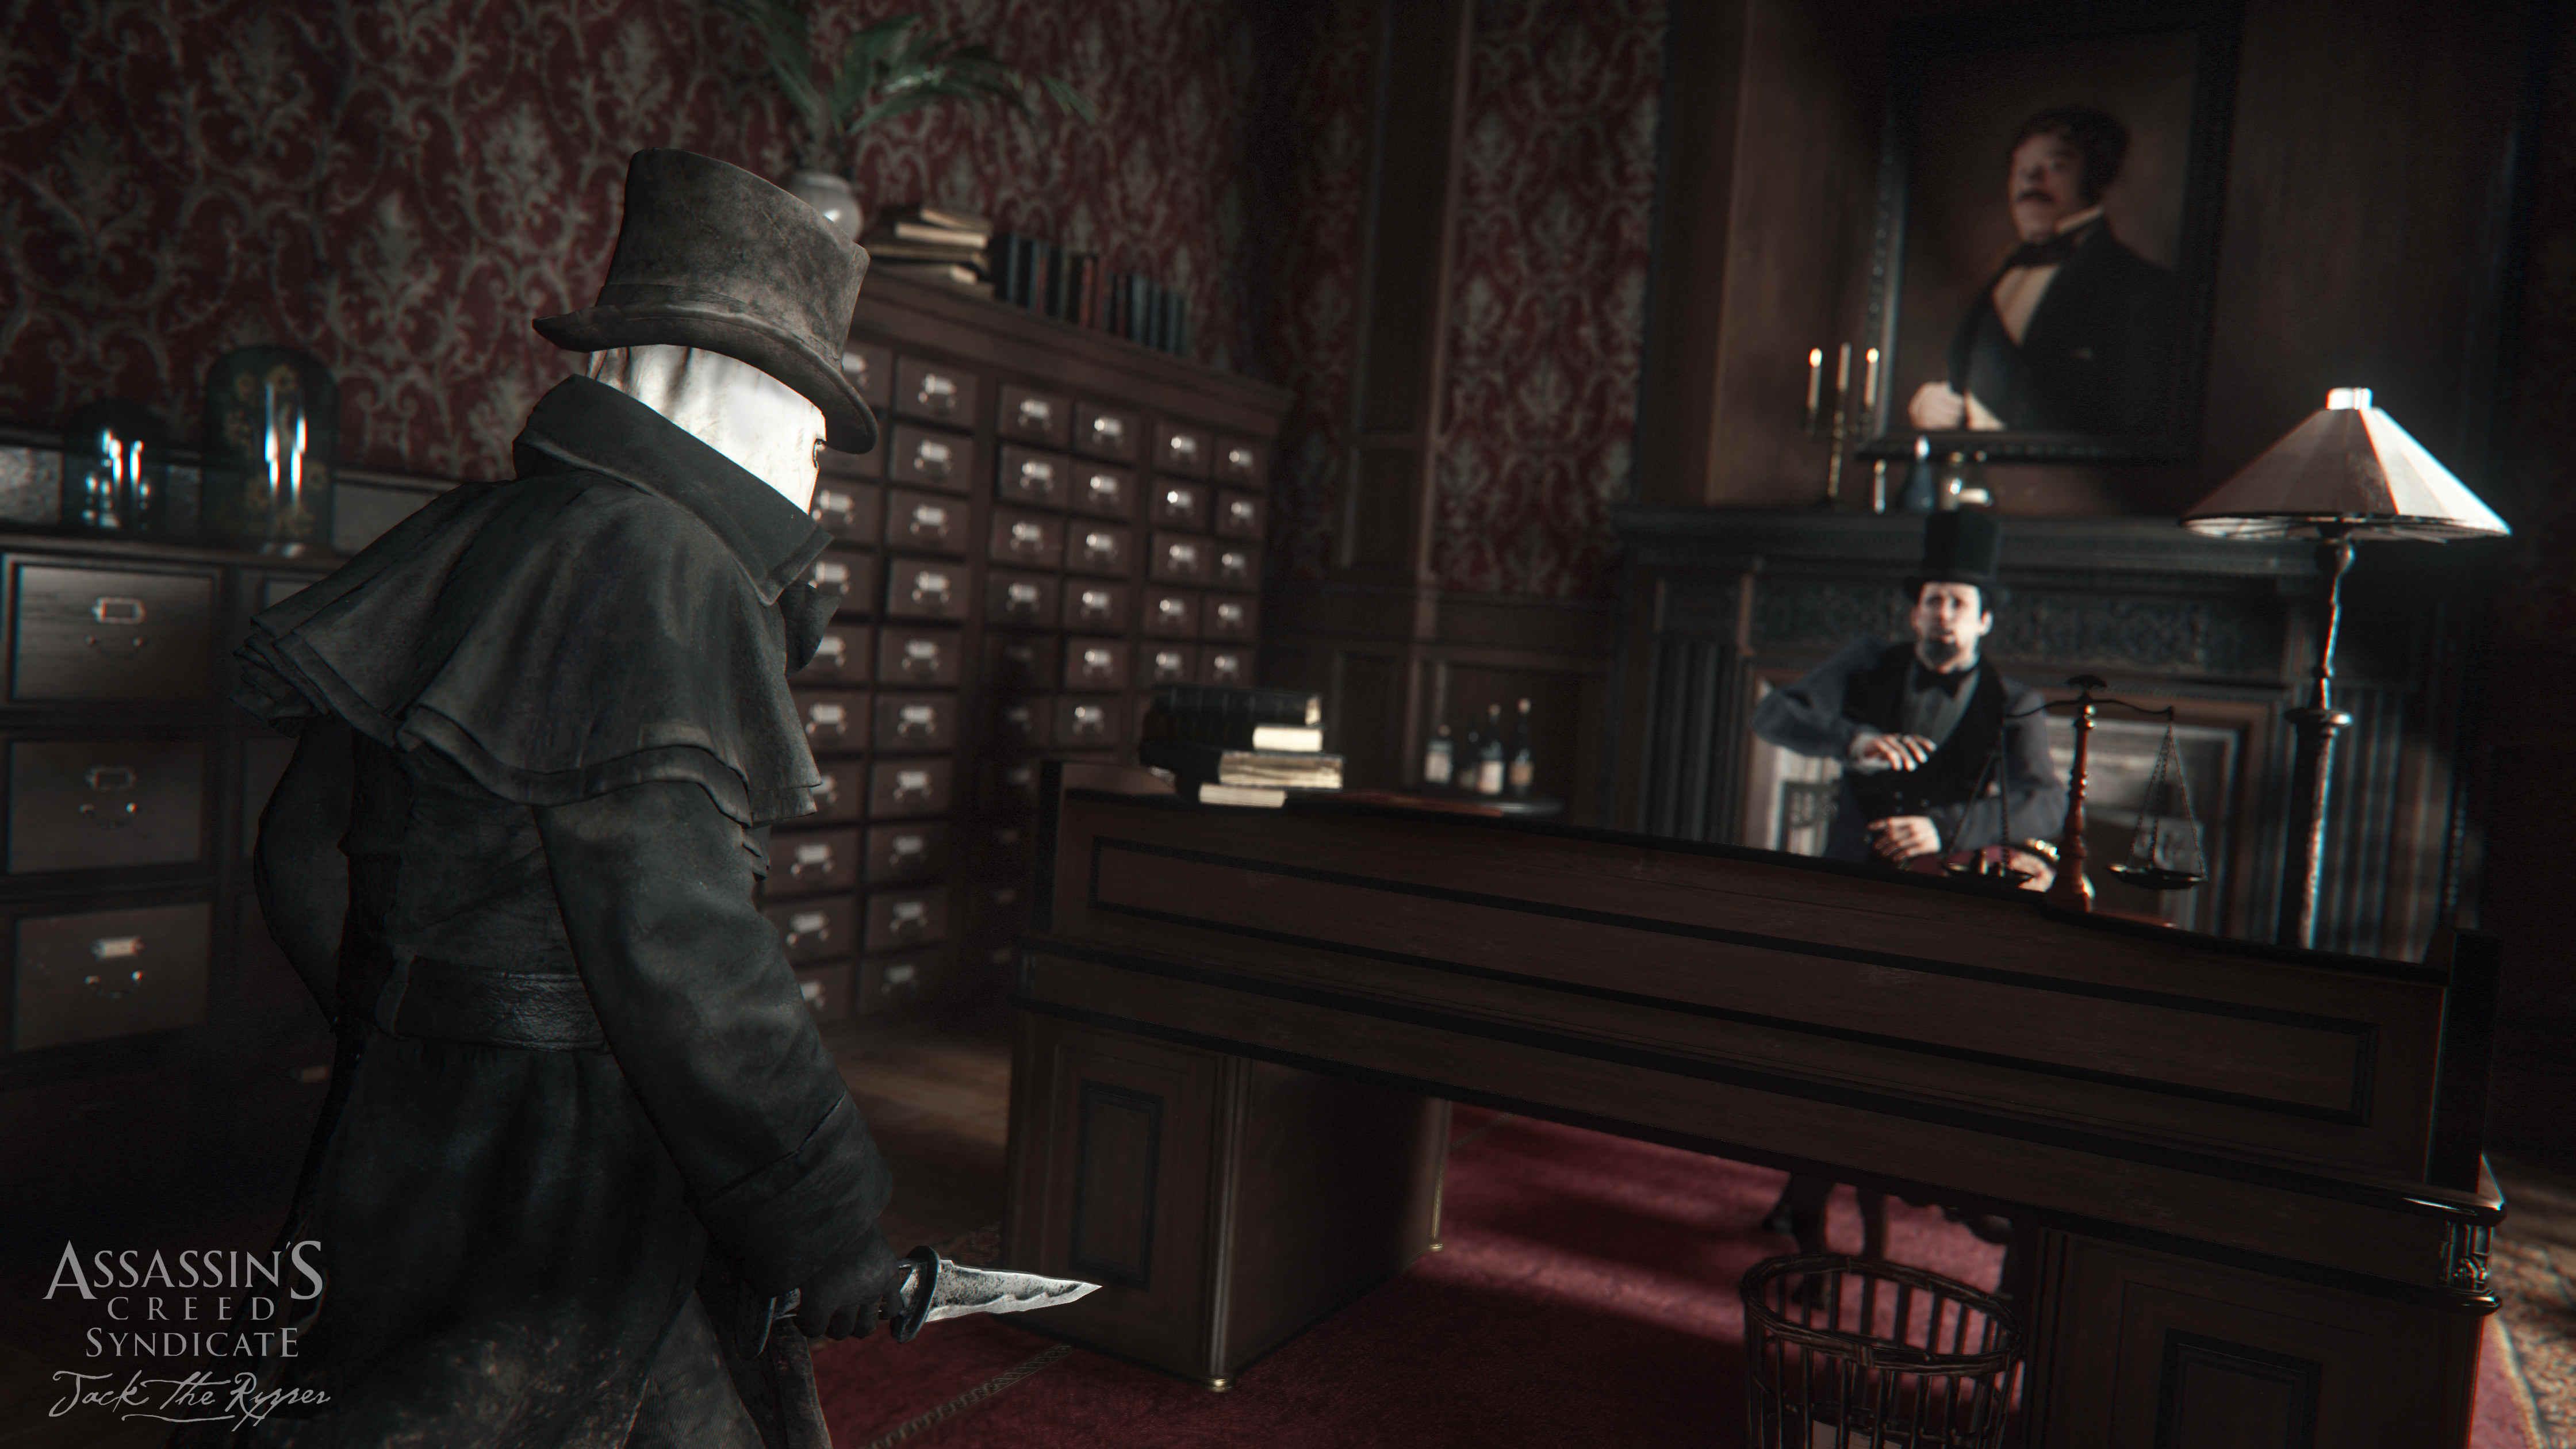 Assassin-sCreed-Syndicate Multi Editeur 018